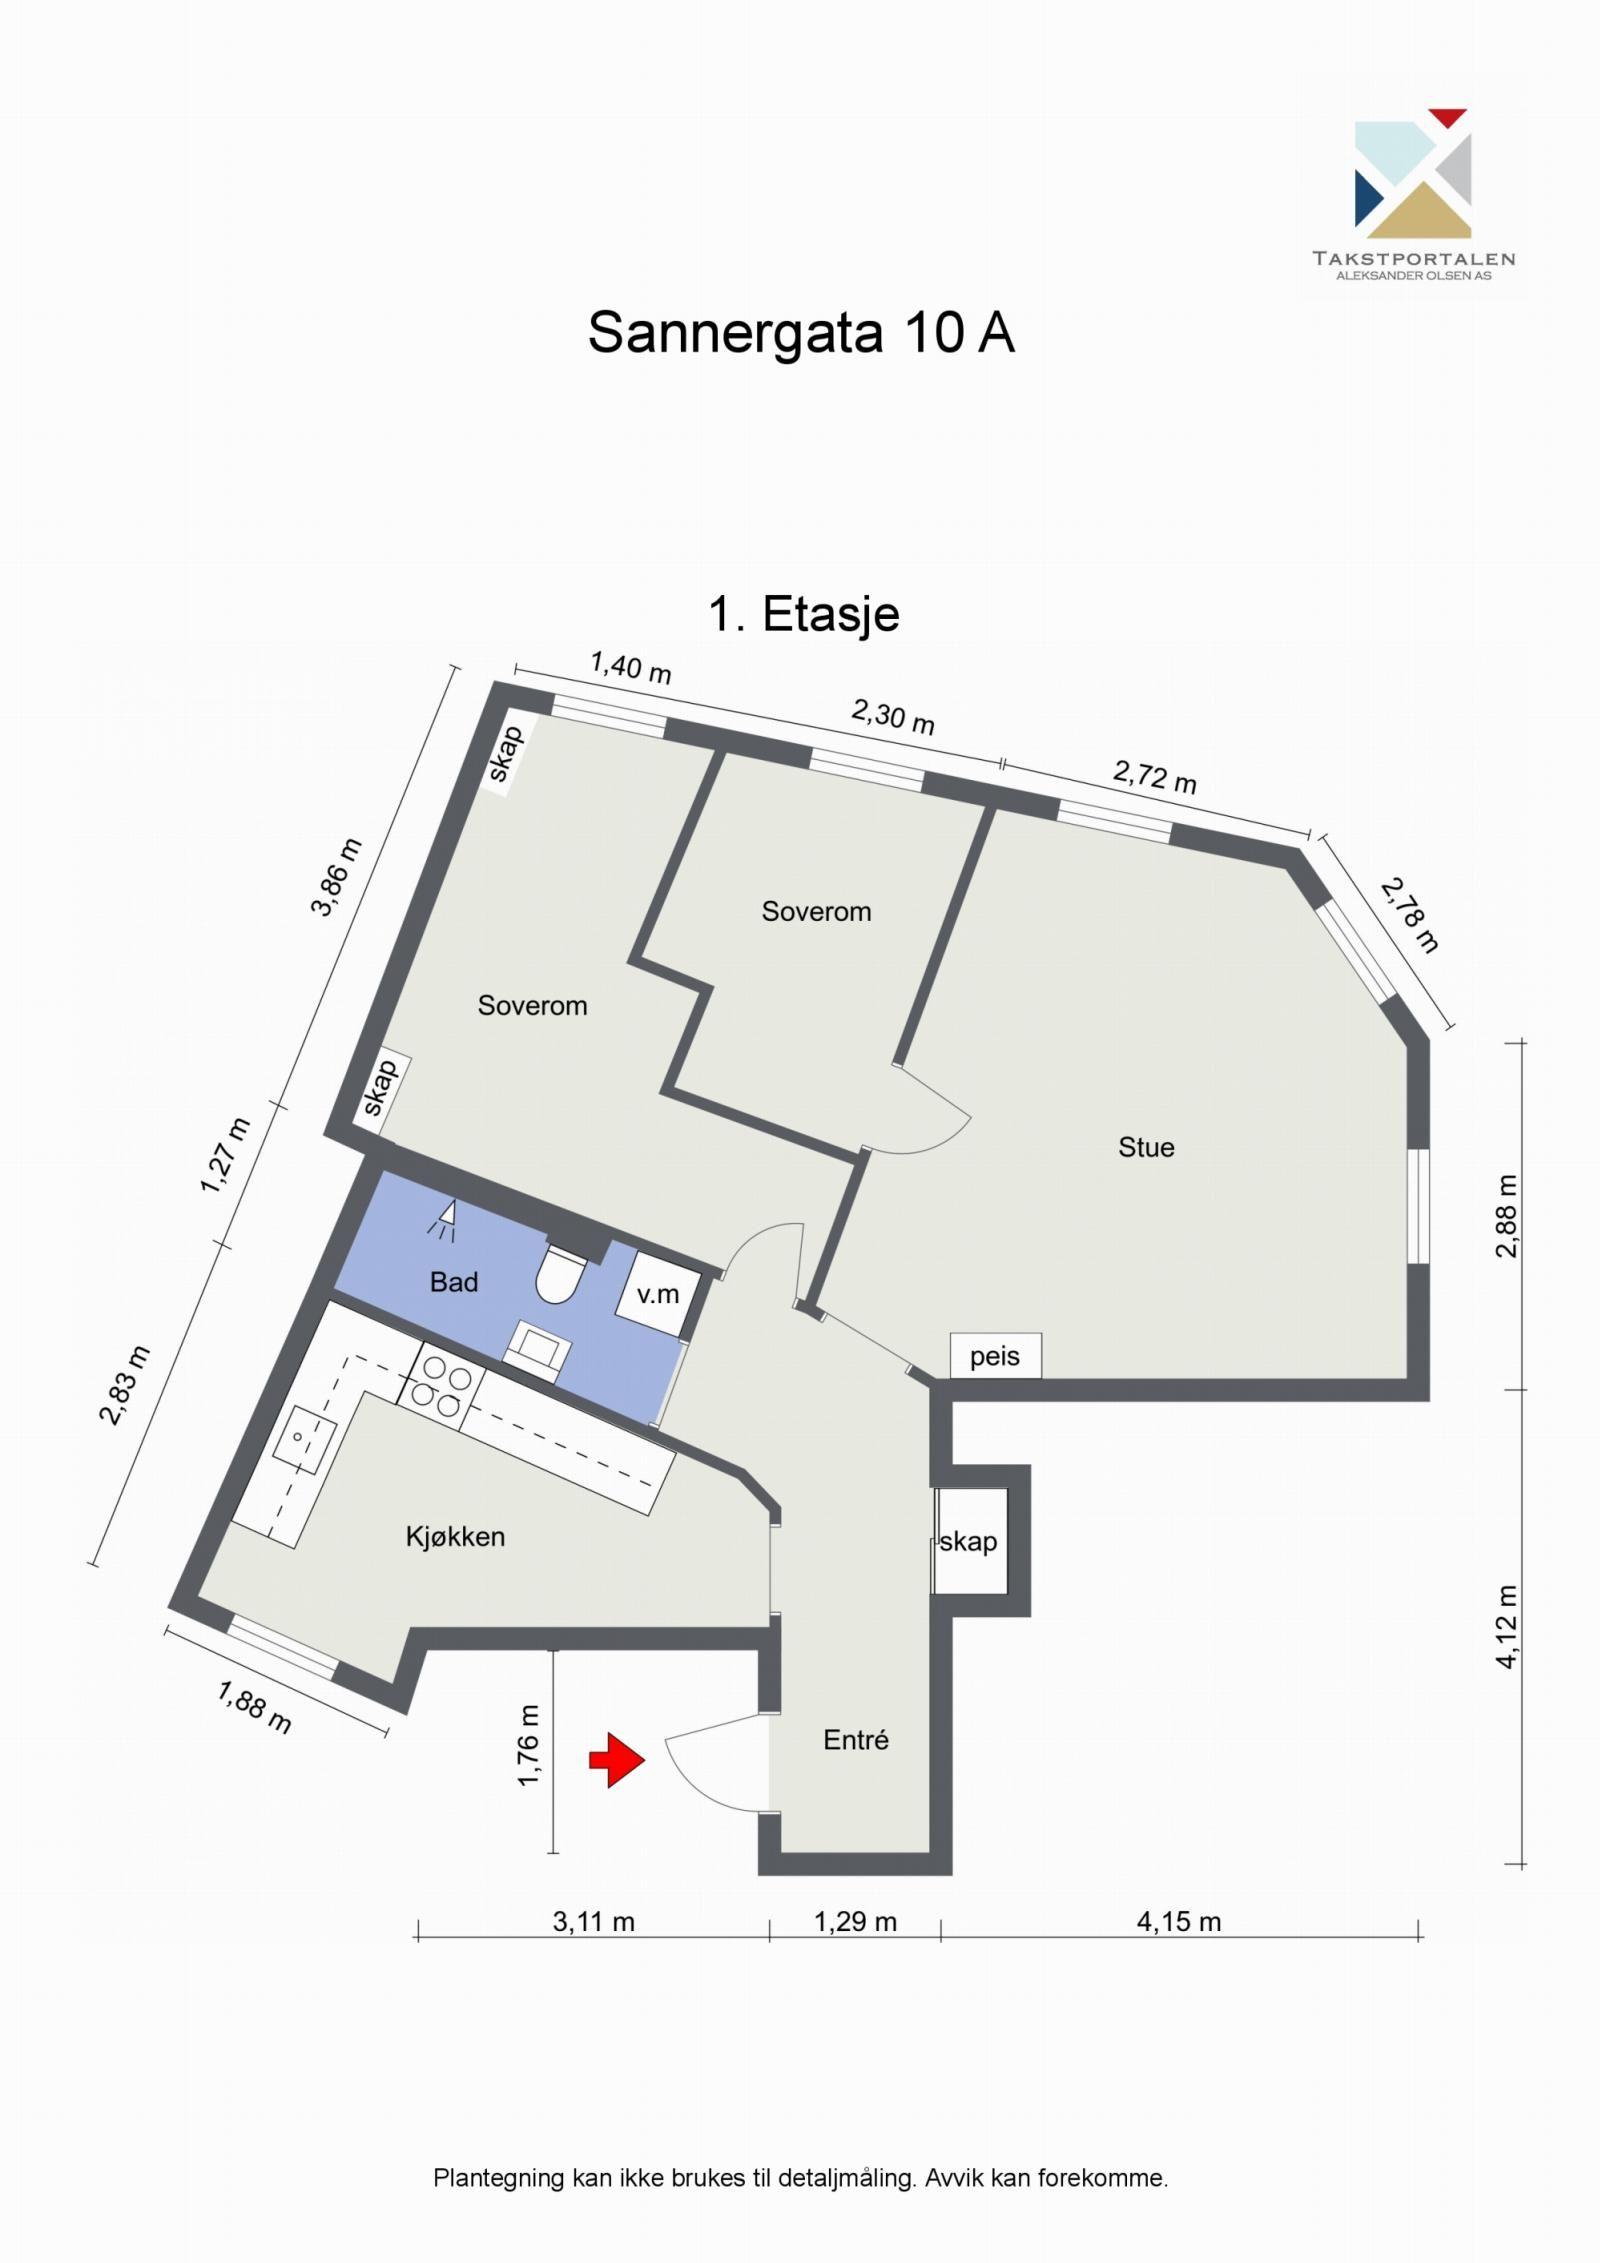 Sannergata 10 Planskisse